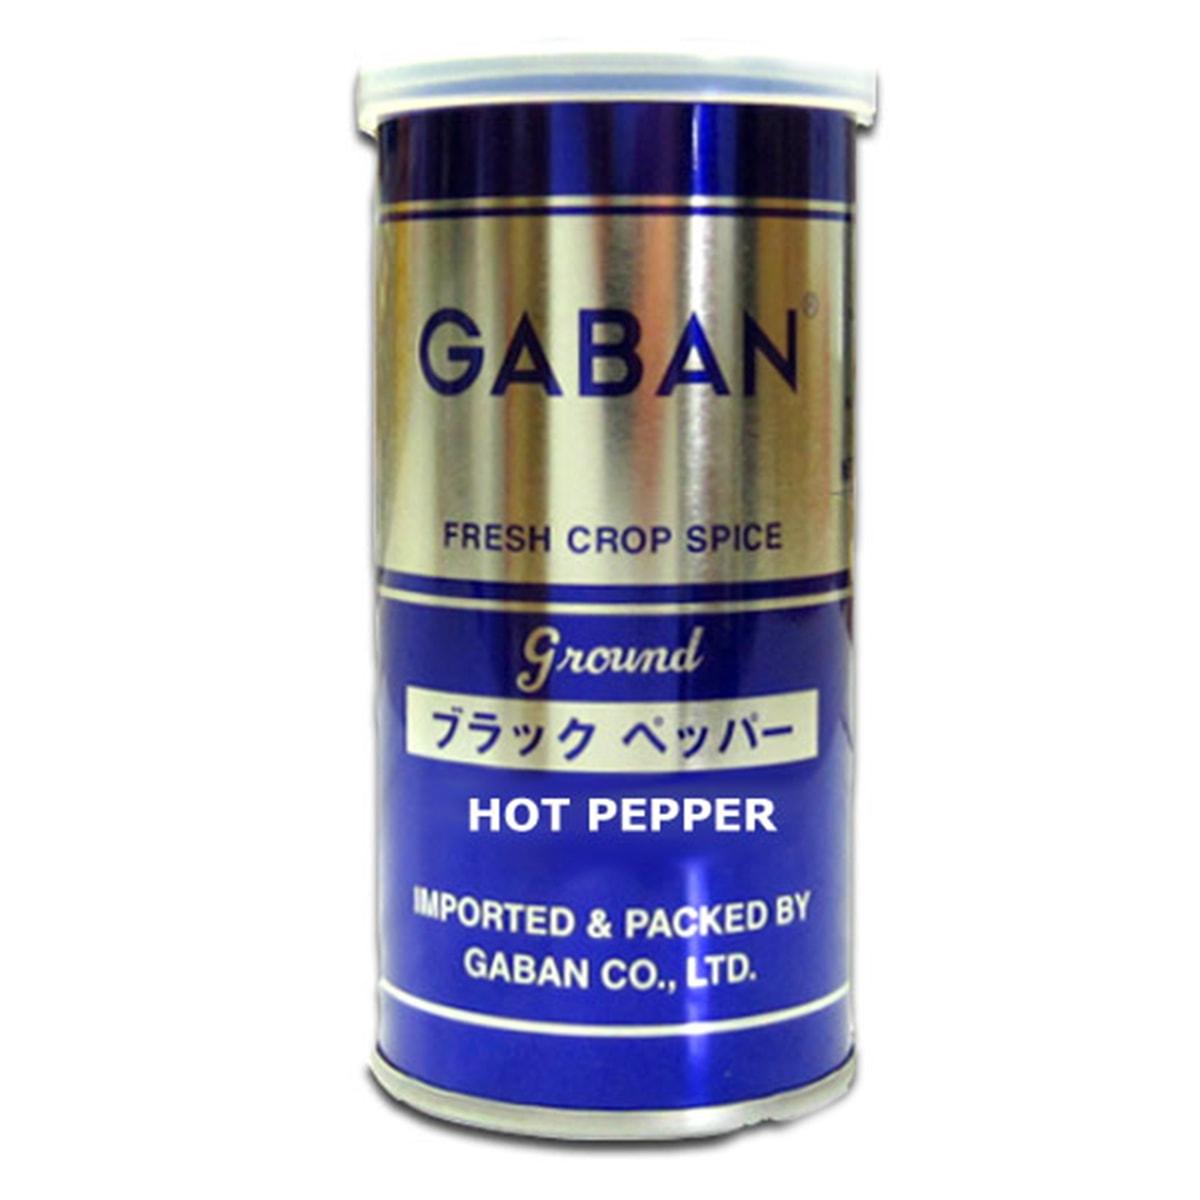 Buy Gaban Sansho Japanese Hot Pepper Ground (Fresh Crop Spice) - 65 gm